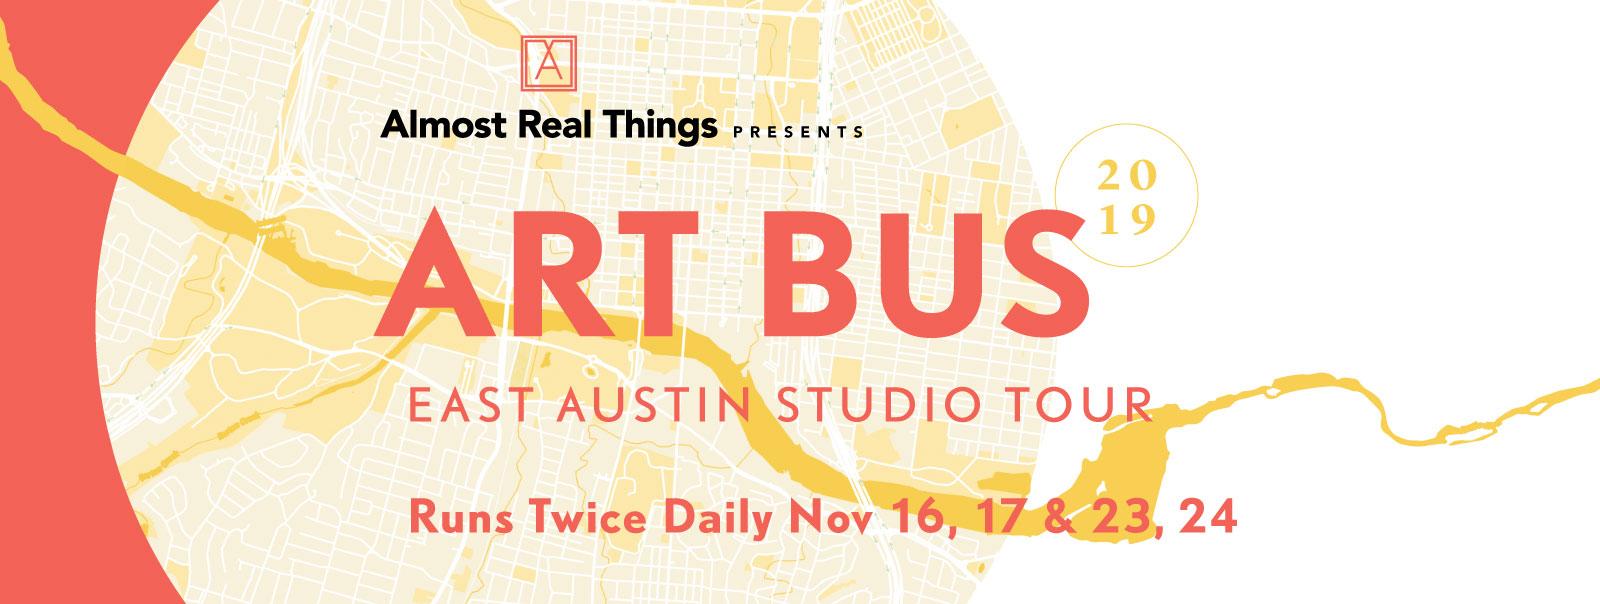 ART BUS Tour for EAST 2019 East Austin Studio Tour in Austin, Texas: November 16, 17 & 23, 24